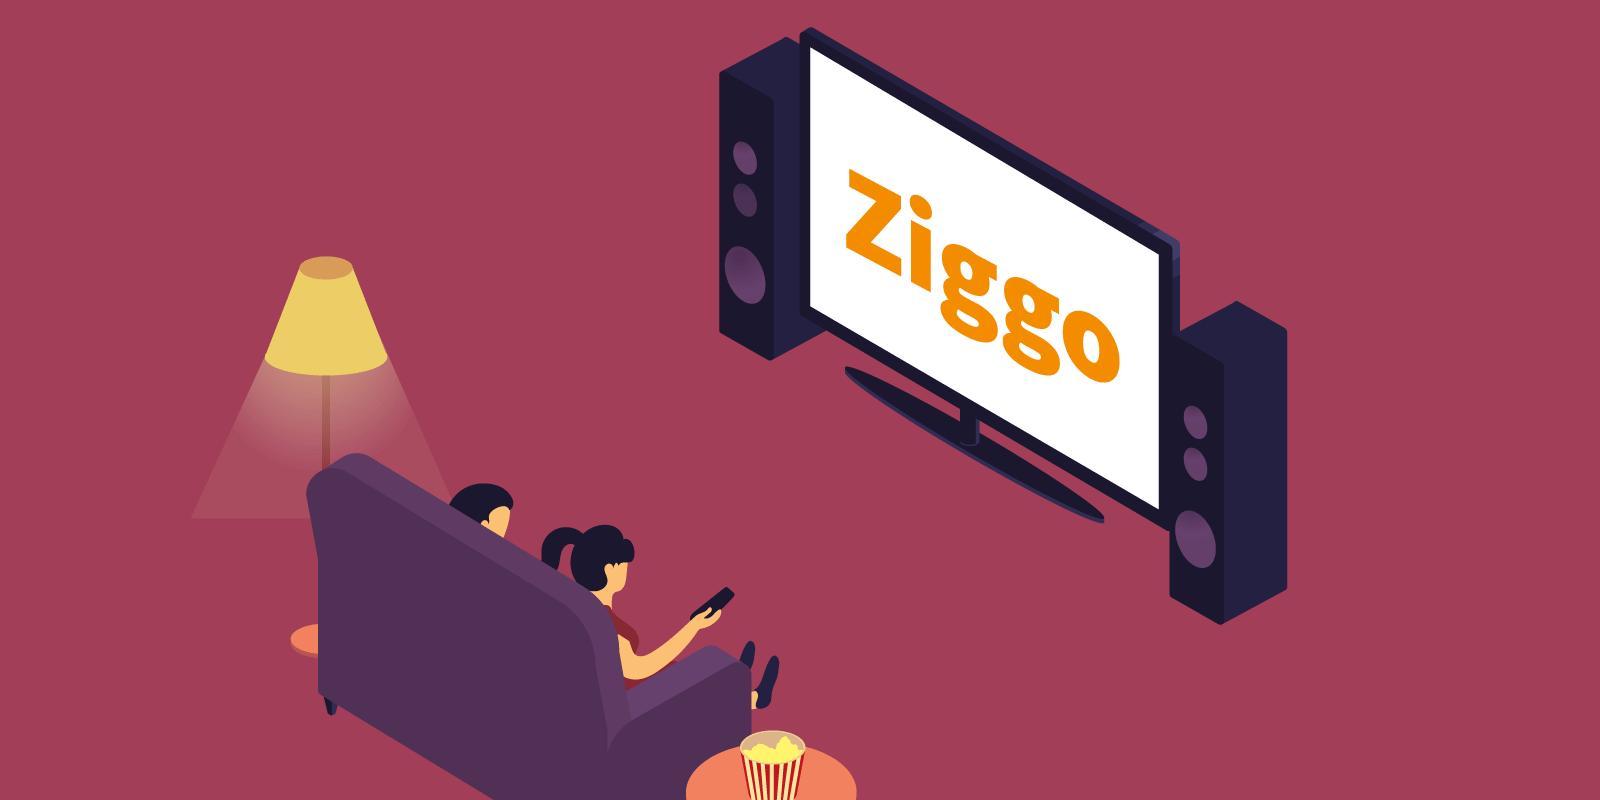 How to Watch Ziggo Anywhere